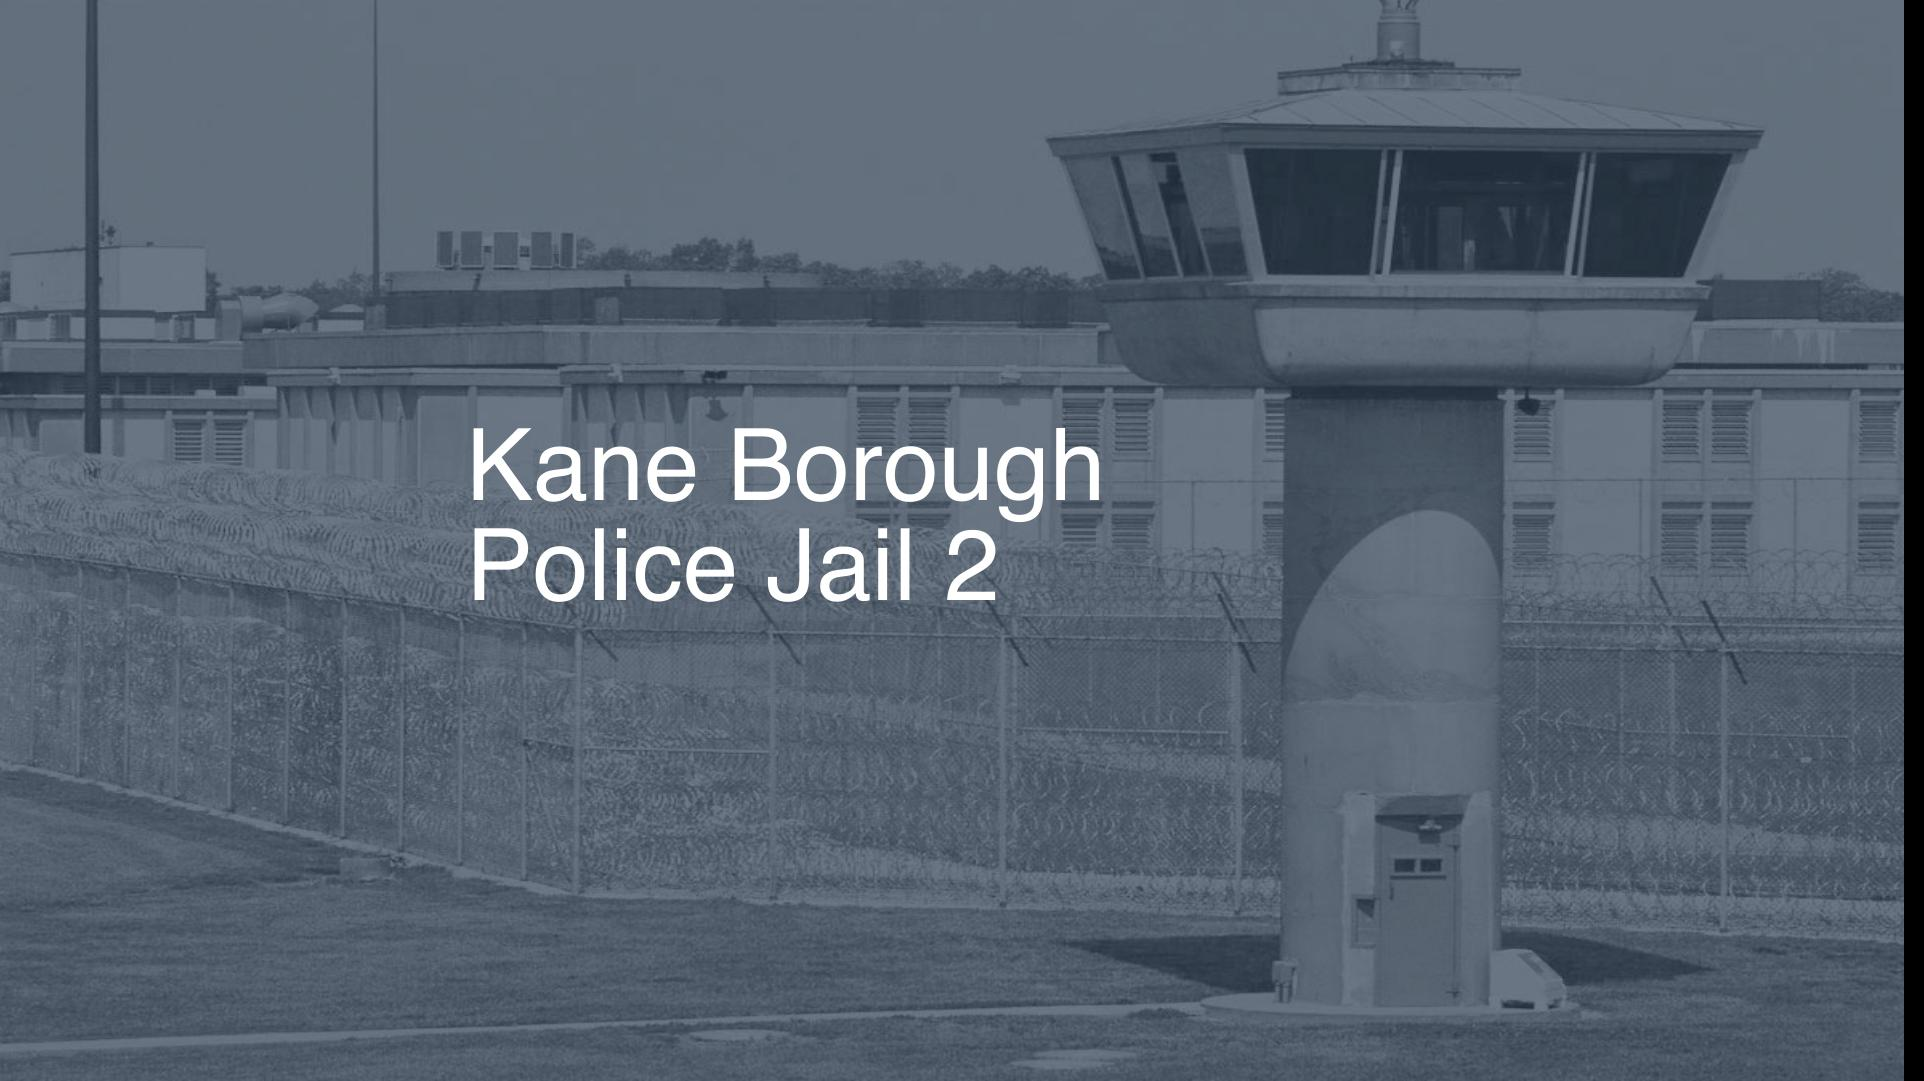 Kane Borough Police Jail correctional facility picture